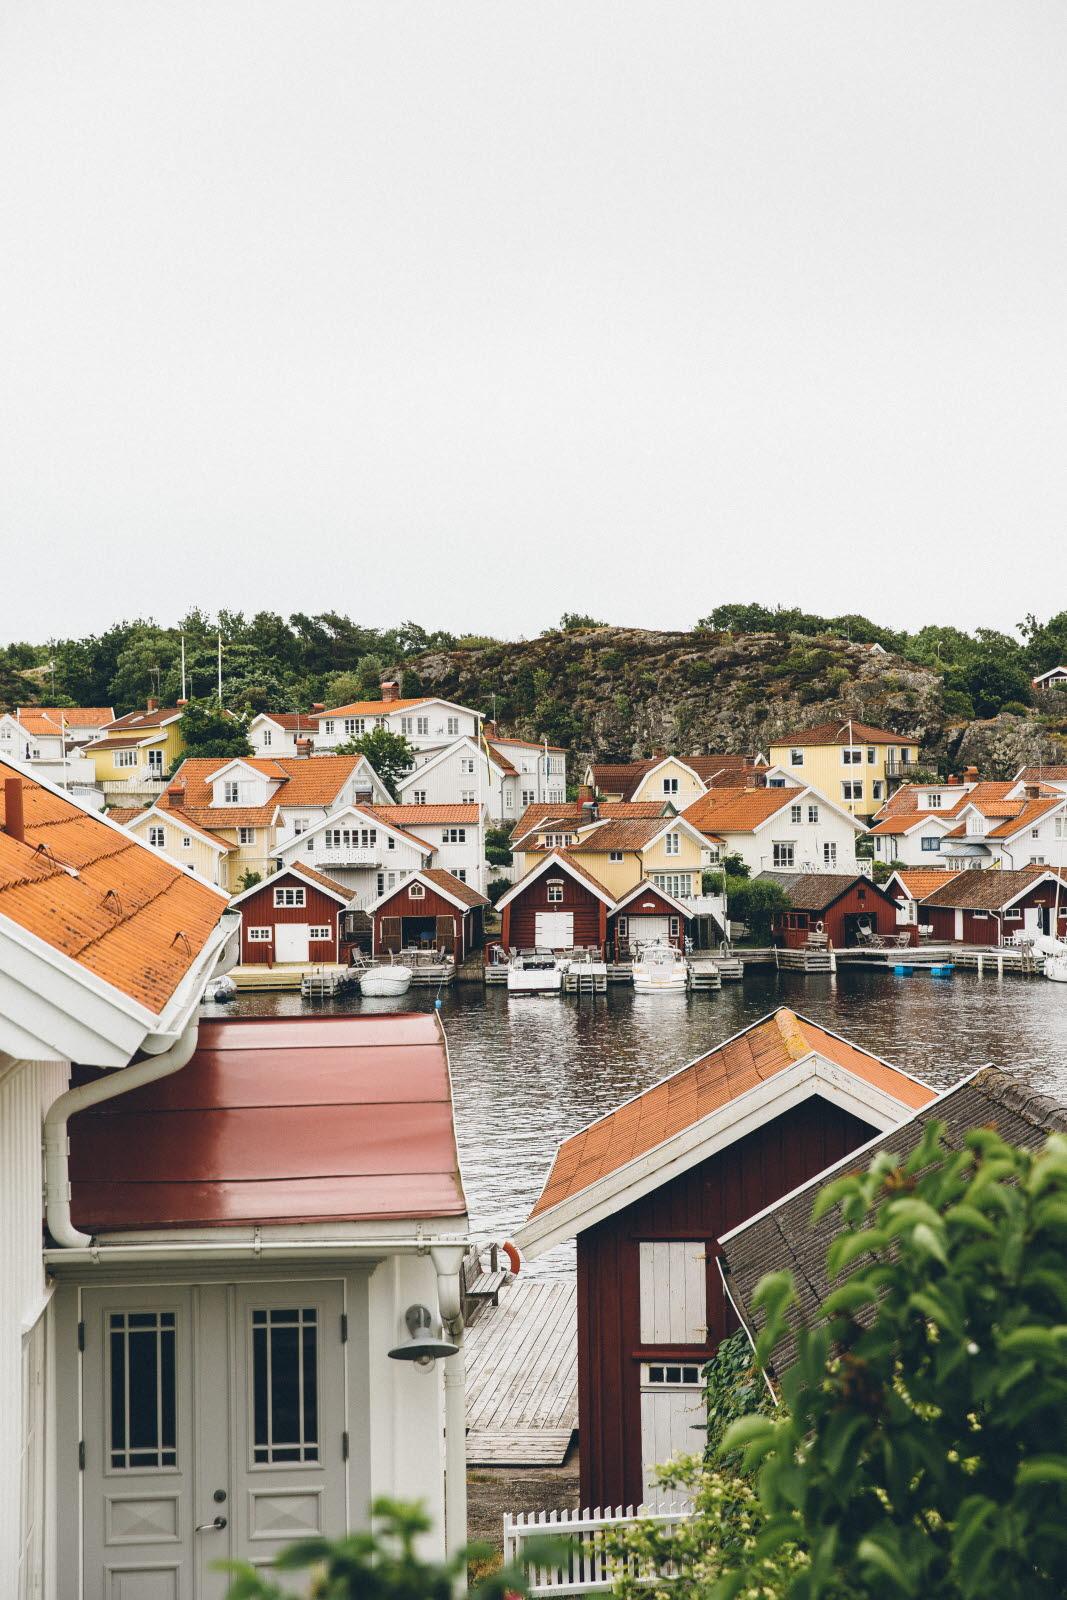 west-sweden-lobster-and-swan-12- Photo Cred Jeska